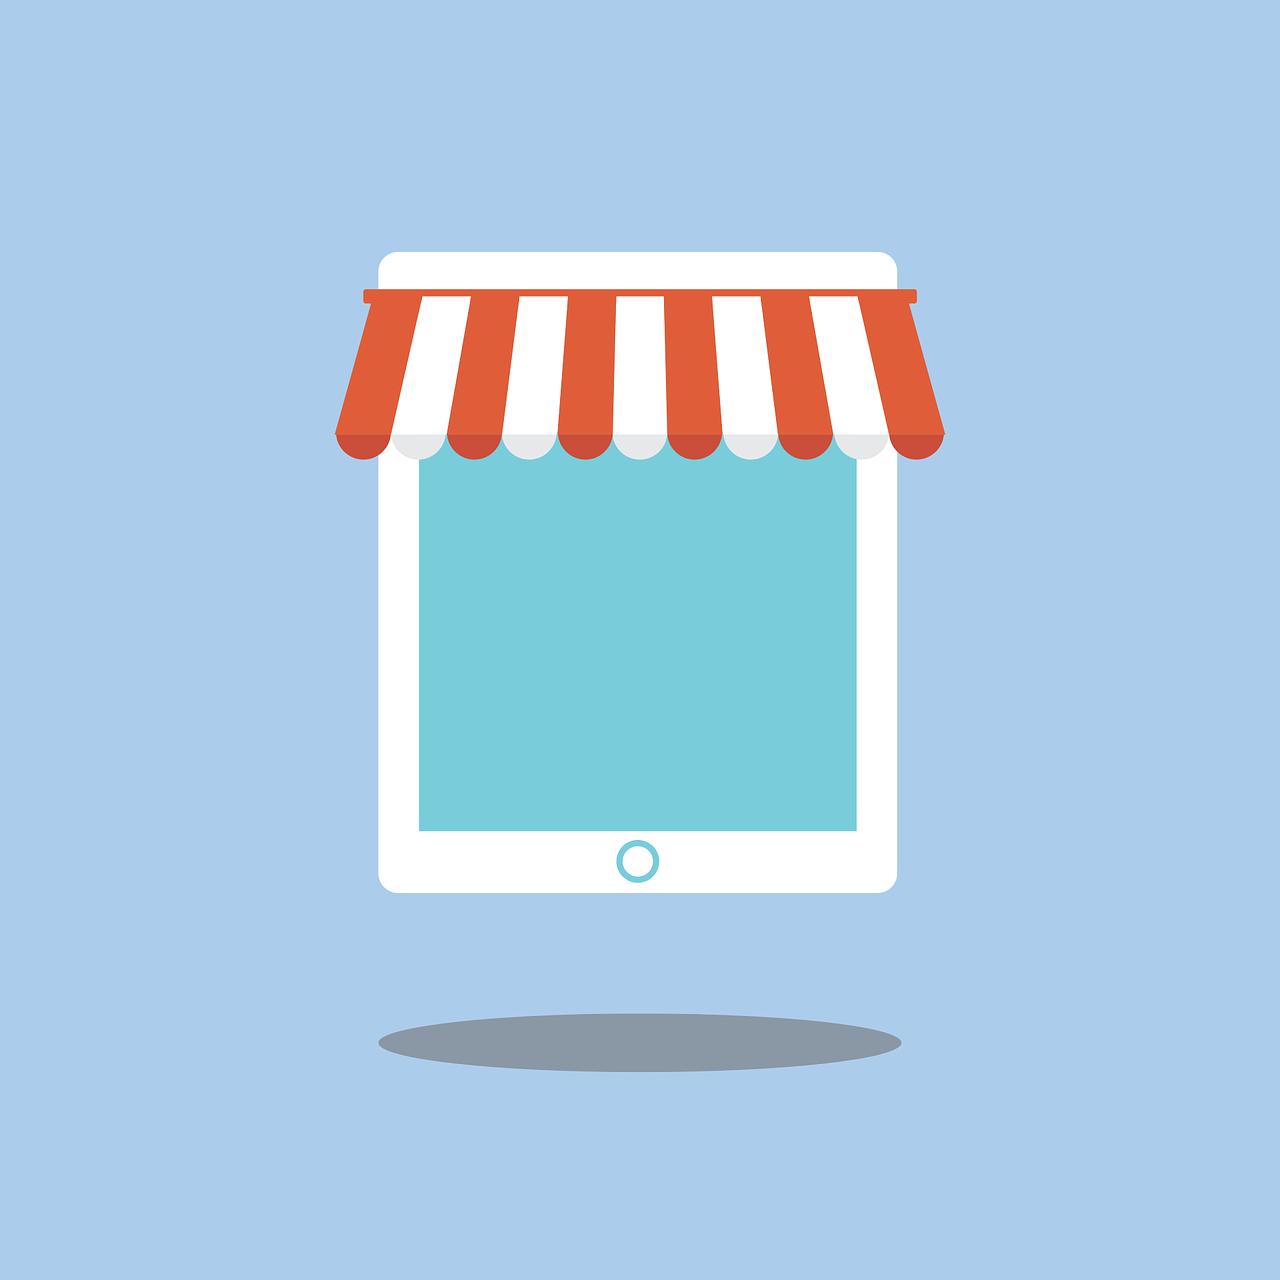 Should You Choose Magento as Your E-Commerce Platform?